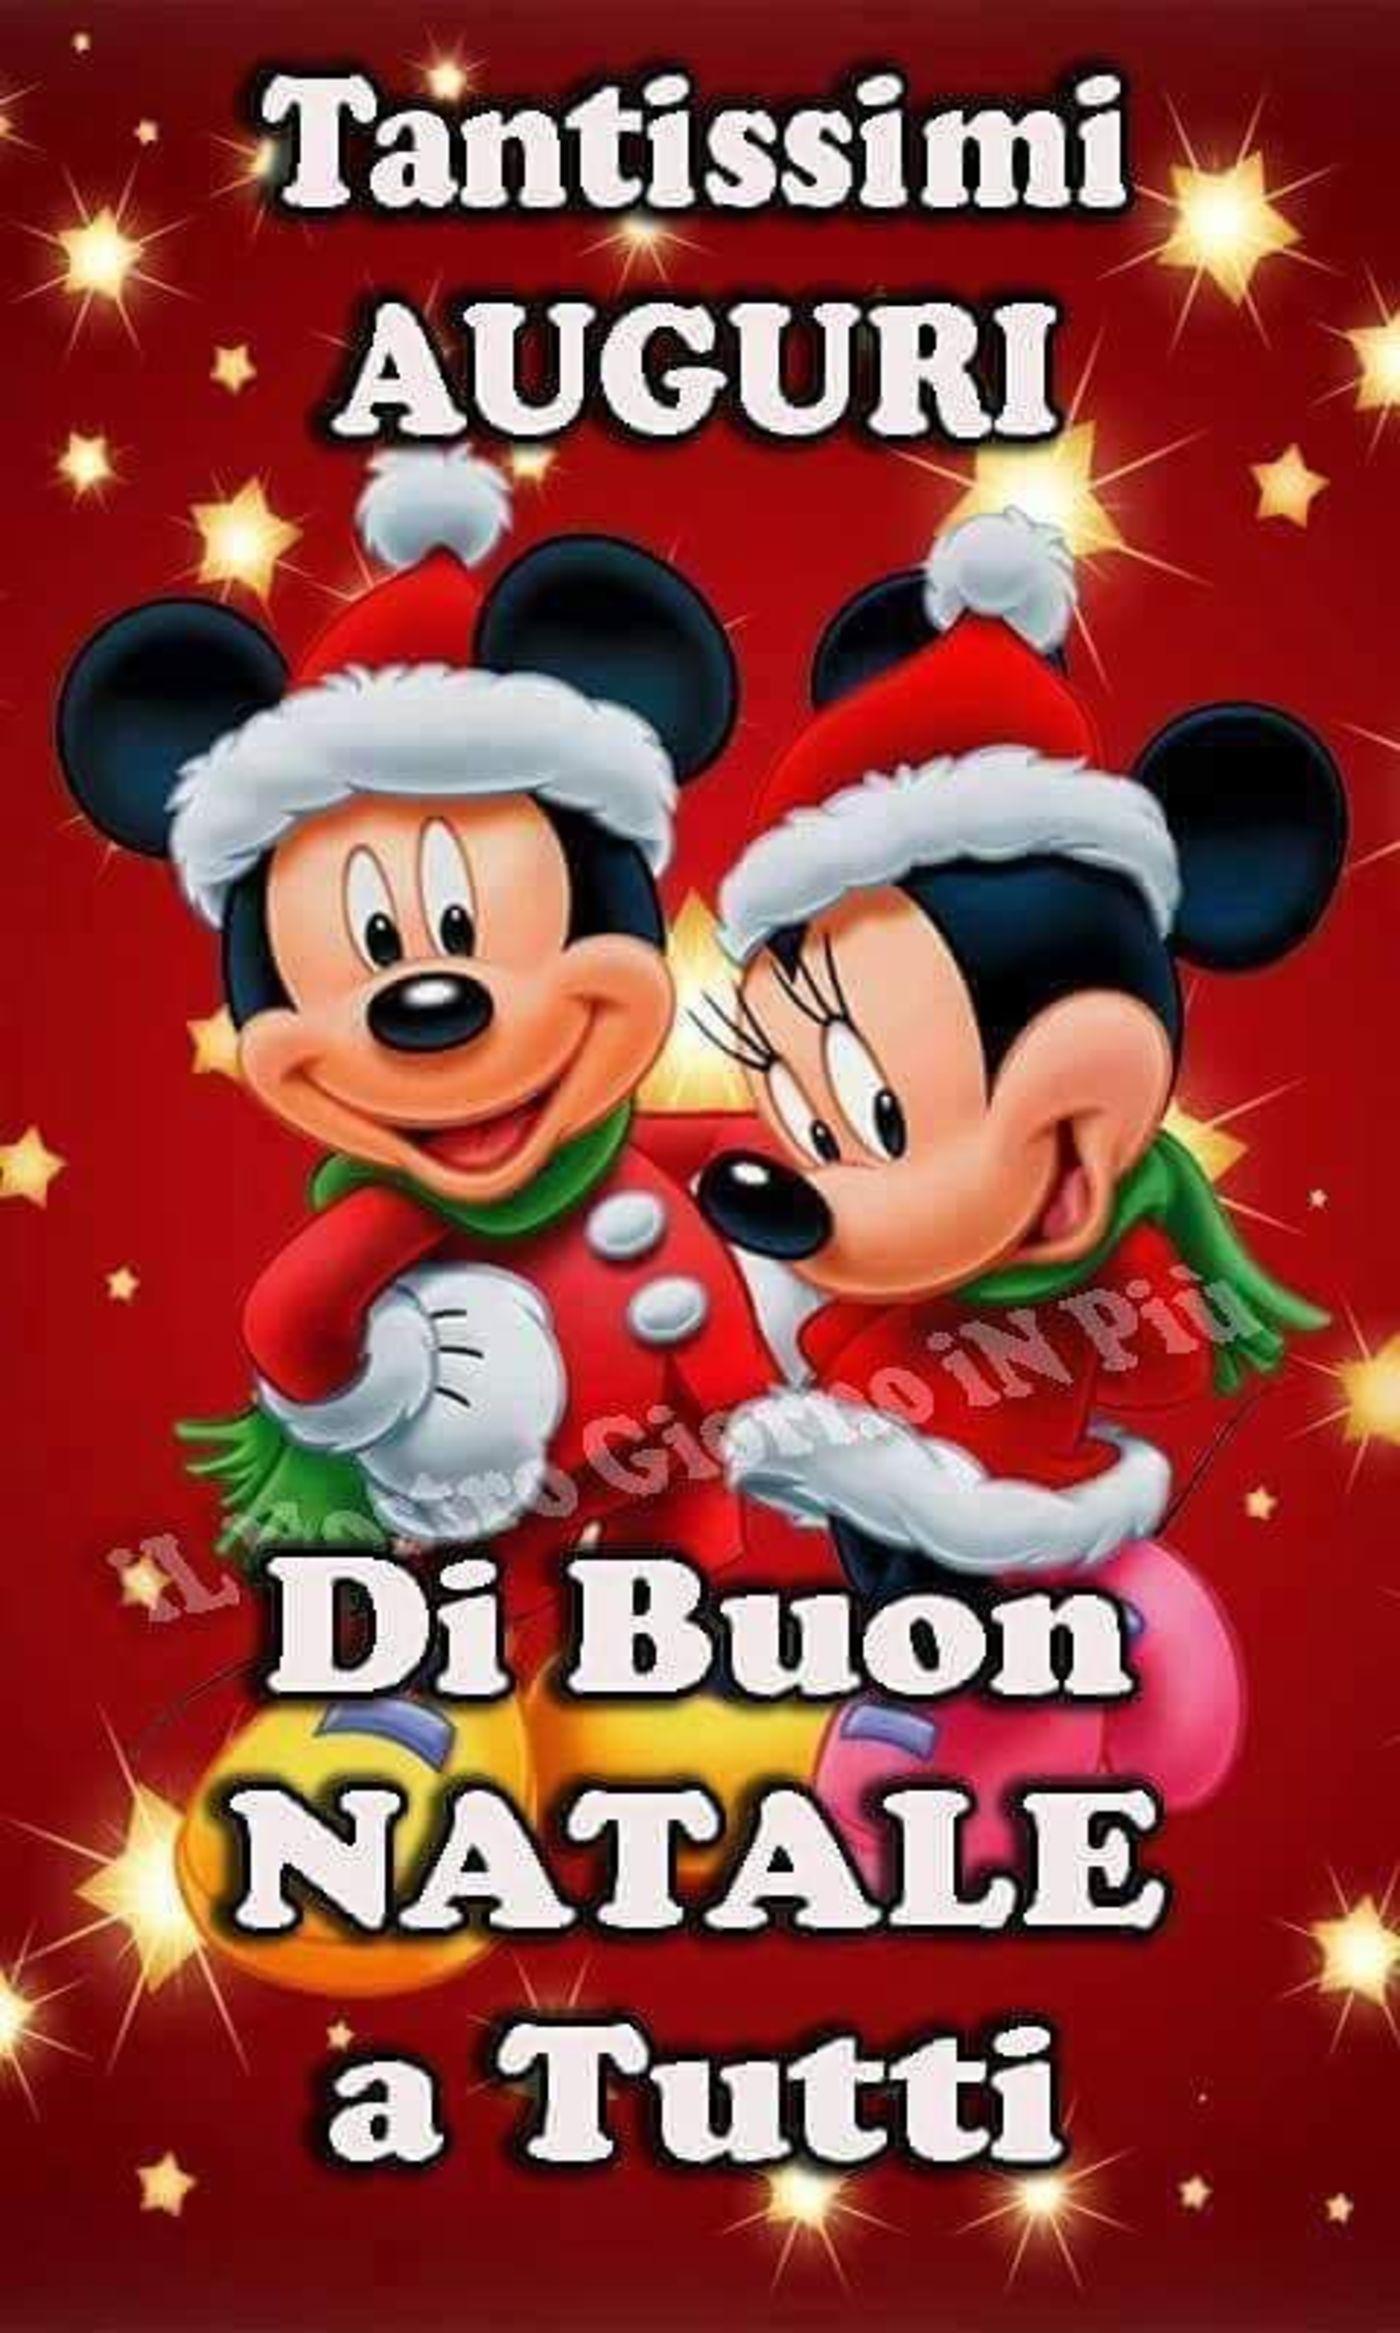 Auguri Di Buon Natale Francese.Tantissimi Auguri Di Buon Natale Auguri Di Buon Natale